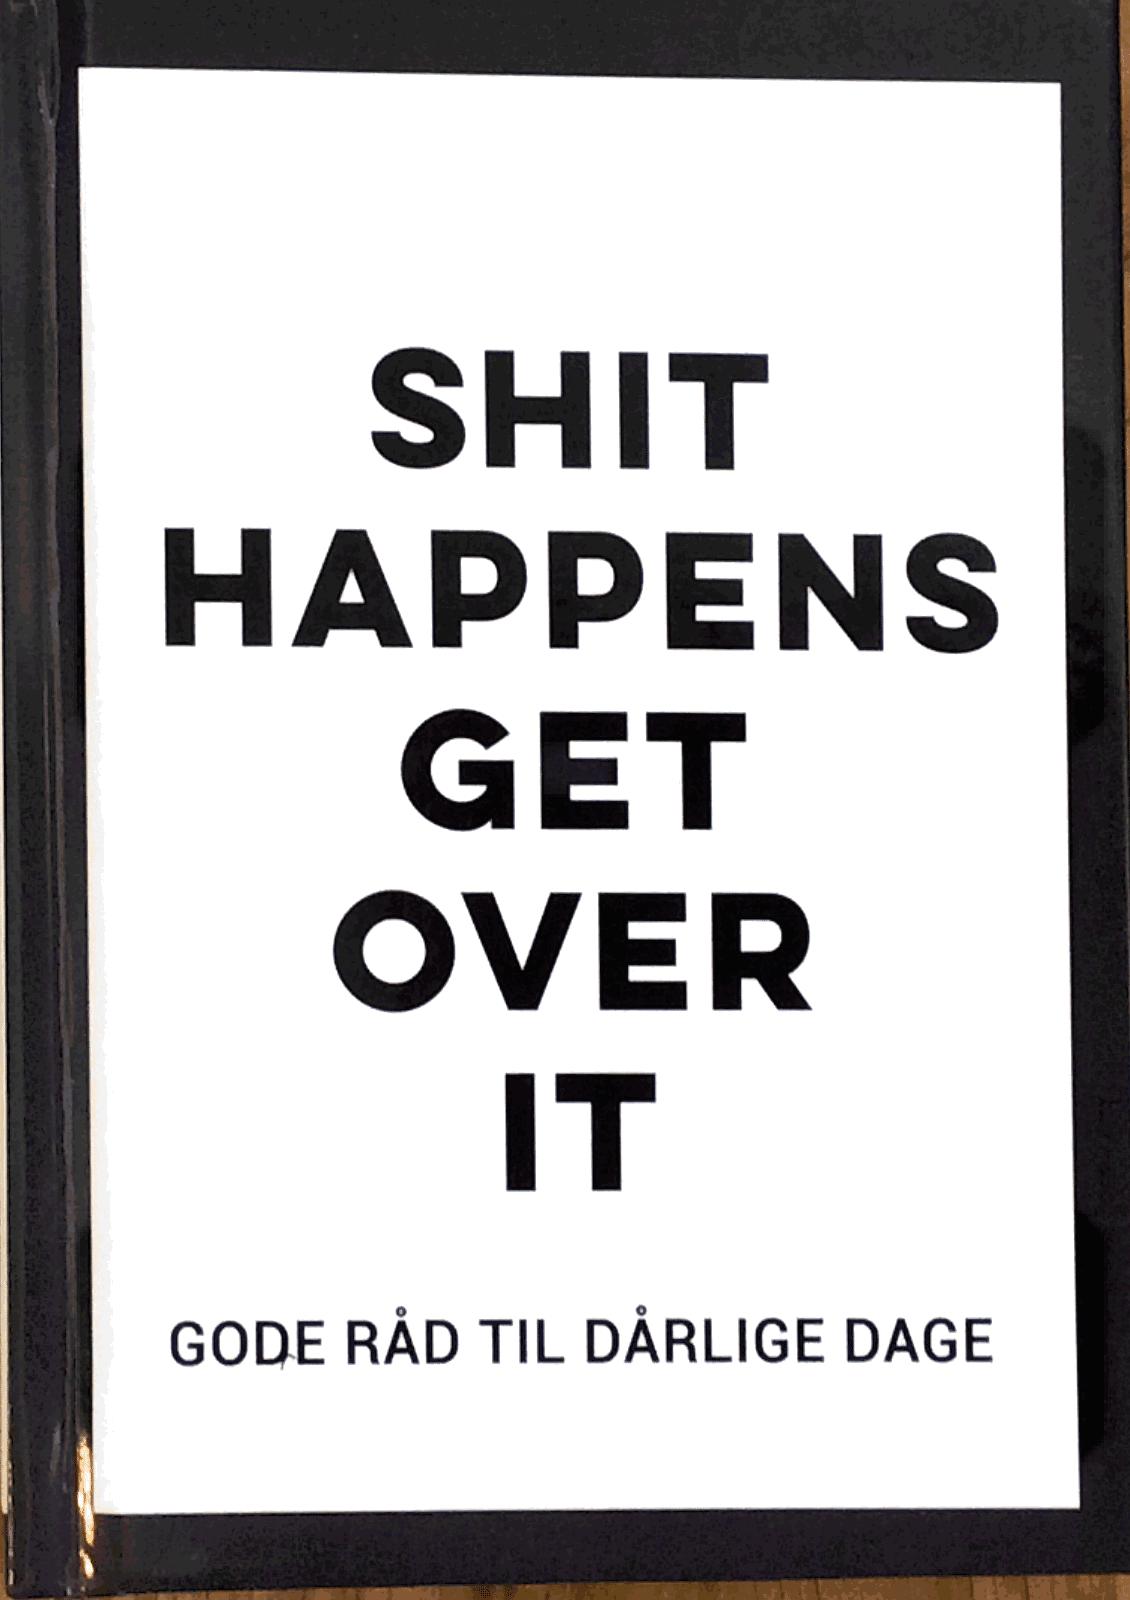 Shit happens – get over it